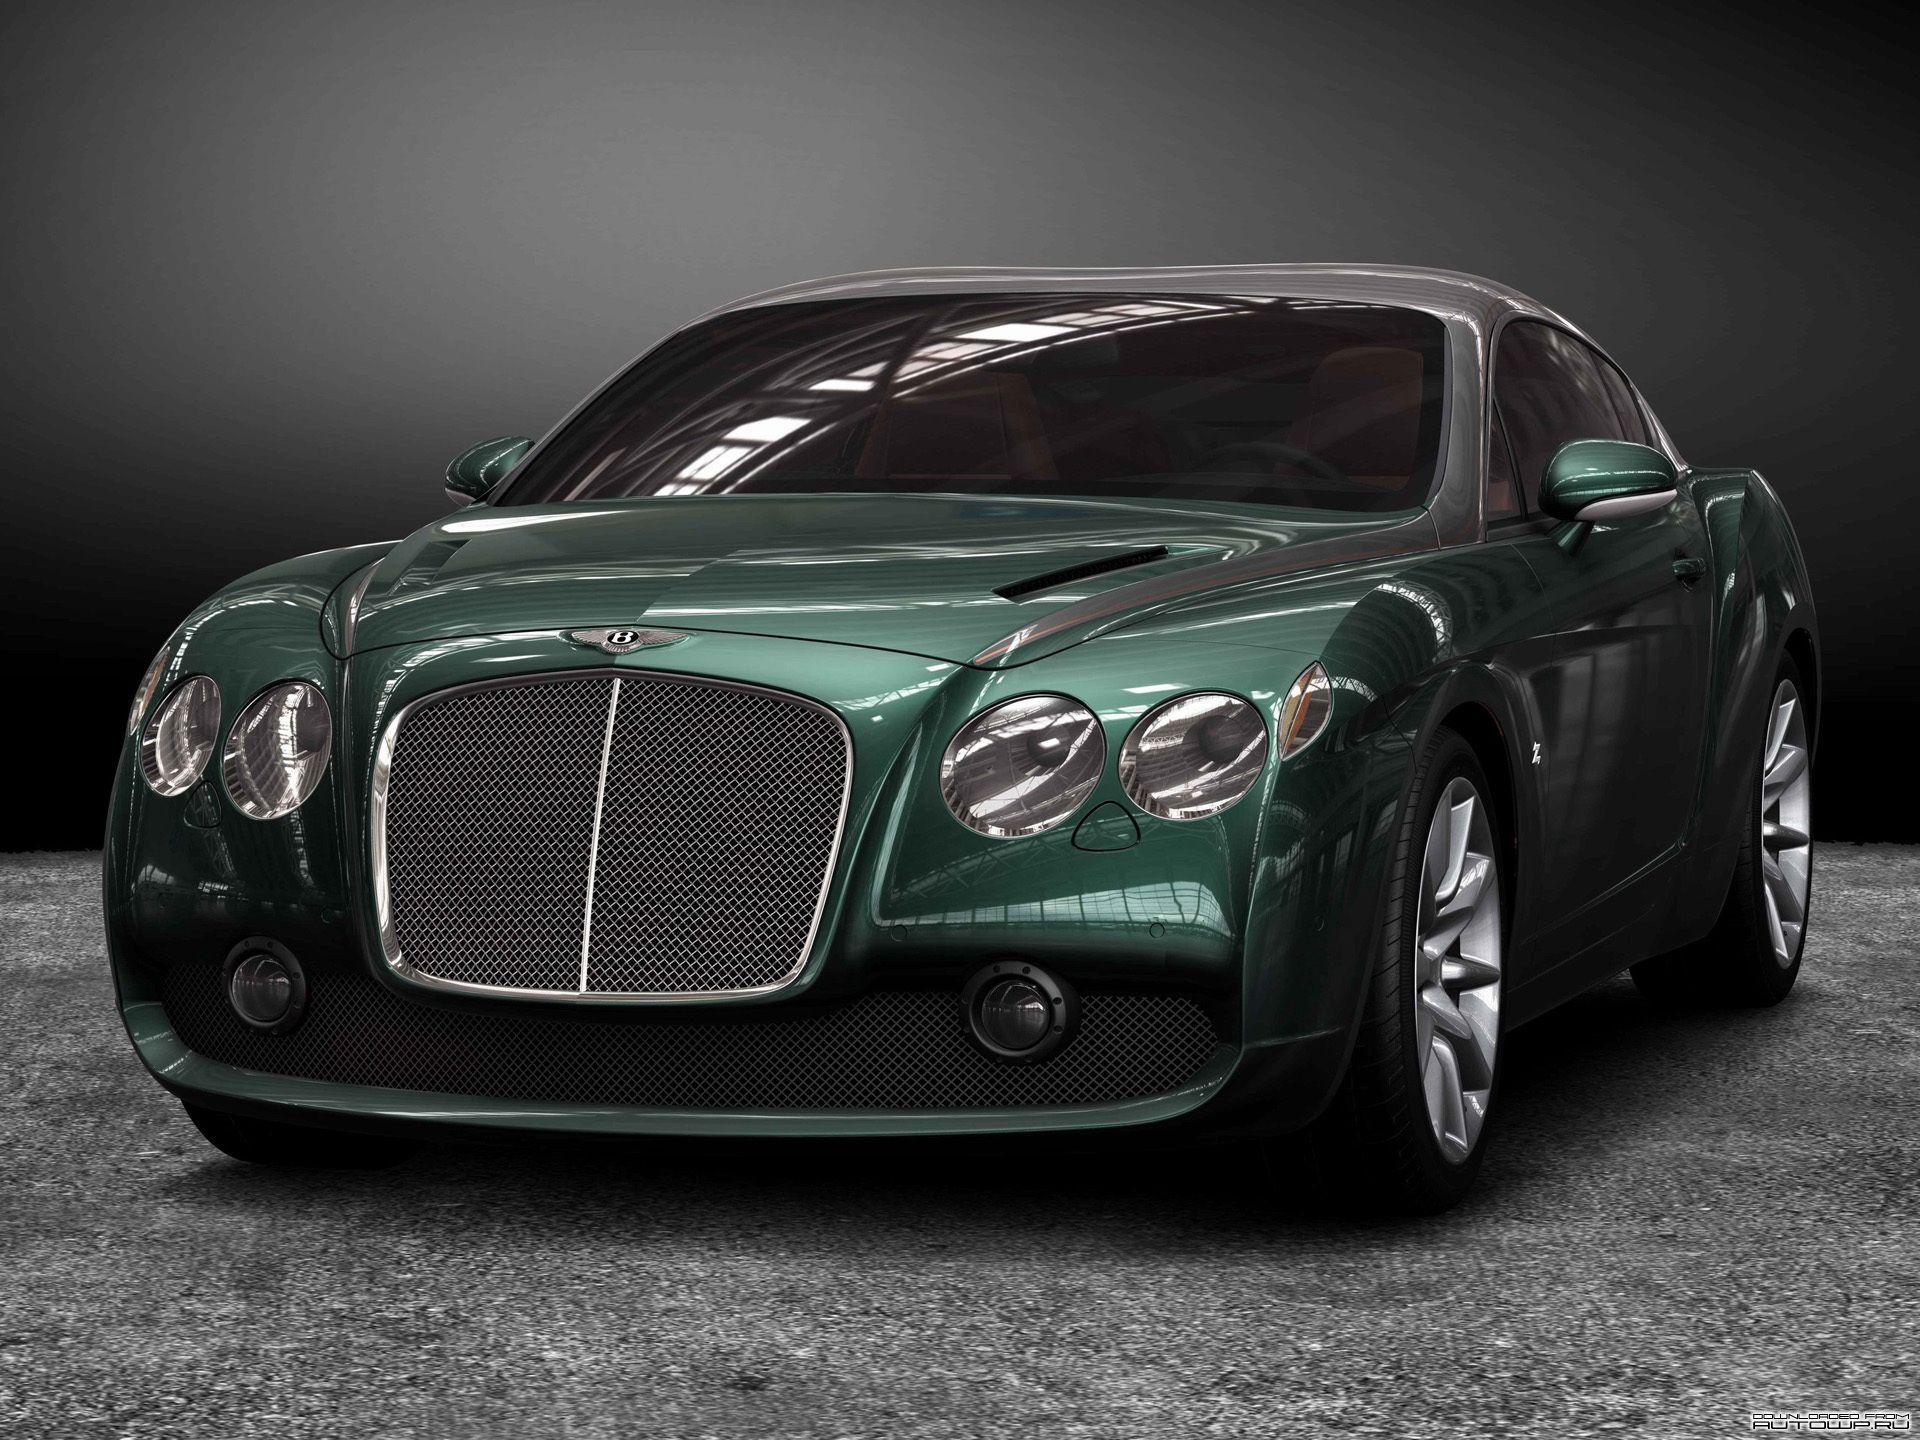 Photos Of New Bentley Cars Bentley Zagato Gtz Wallpapers With